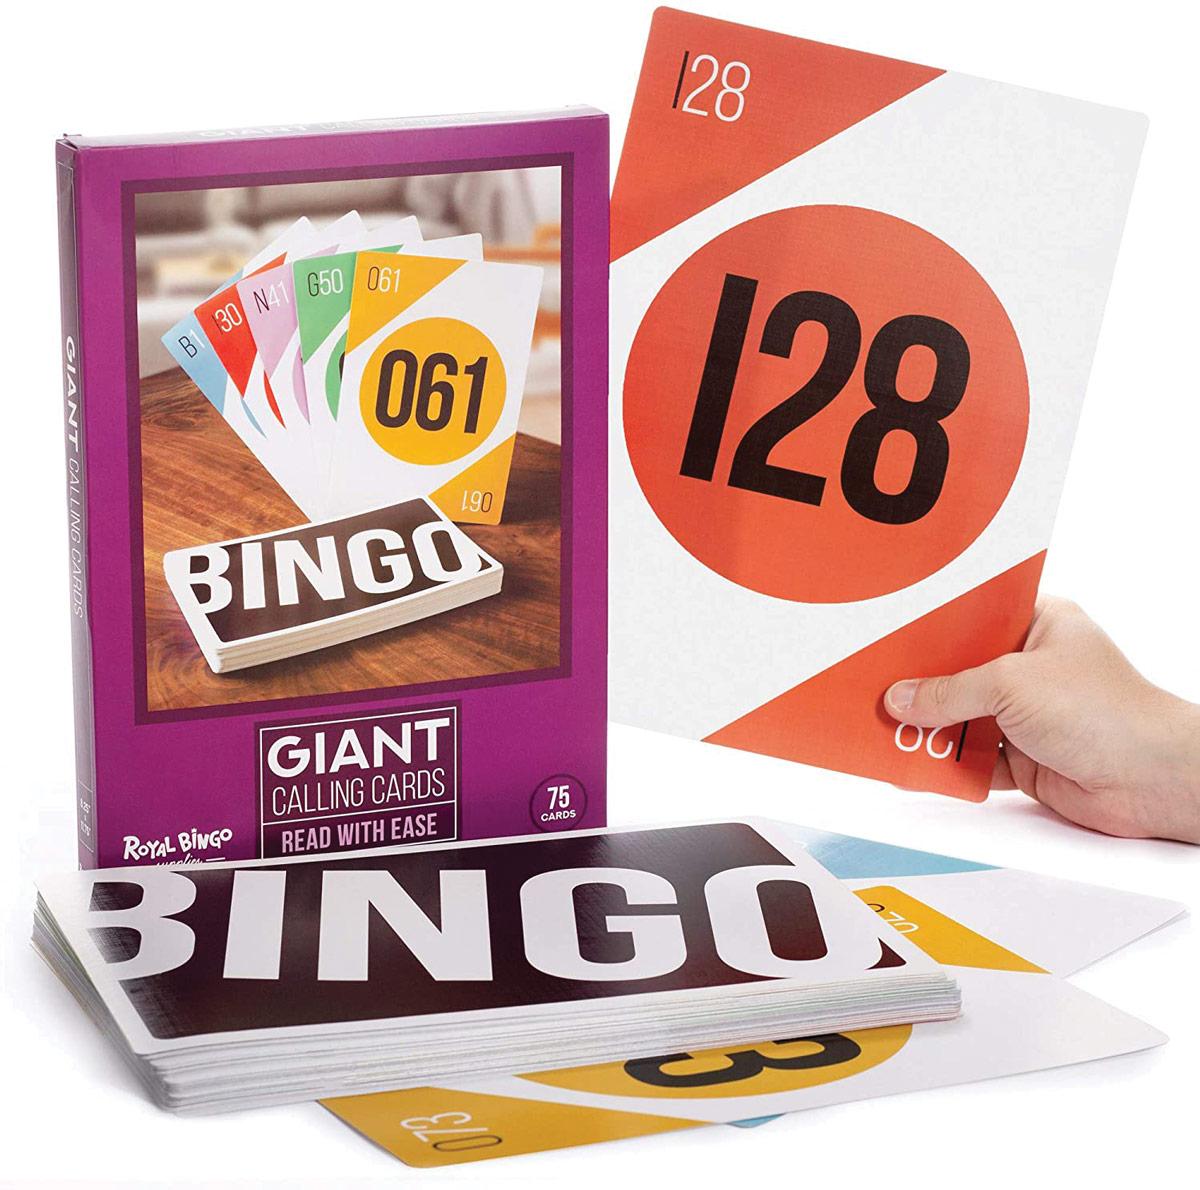 Giant Bingo Calling Cards